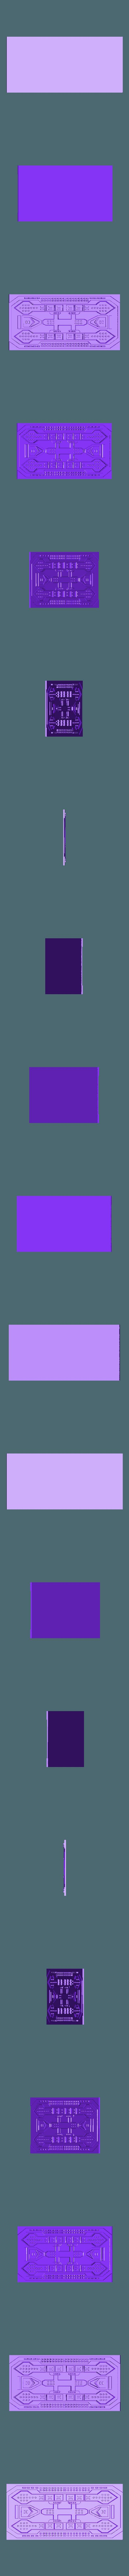 screen_1_back.stl Download free STL file ORCA communicator (Godzilla) • 3D printing object, poblocki1982